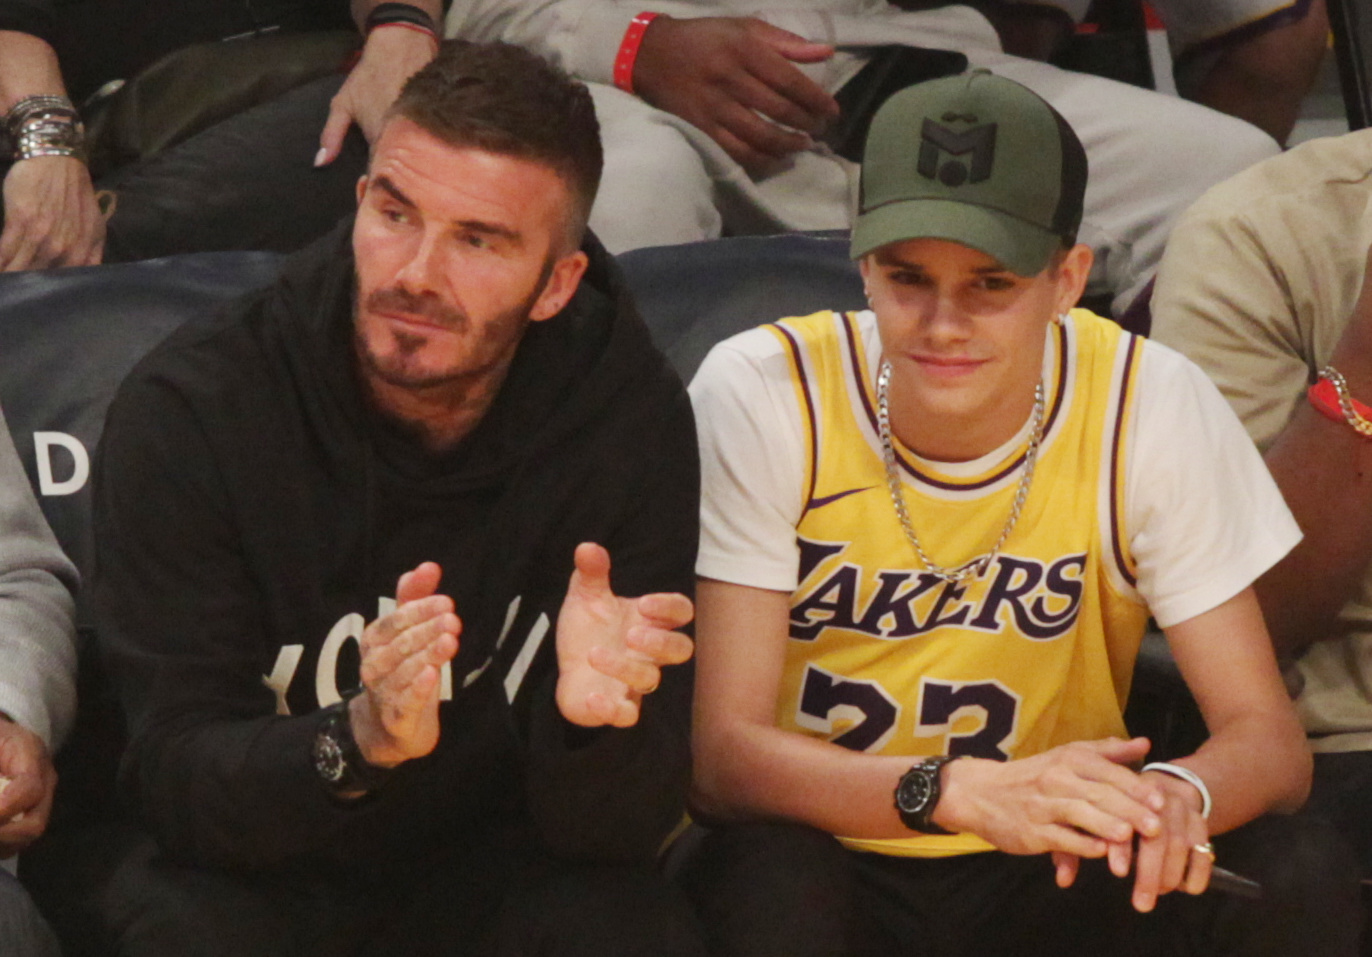 David Beckham and son Romeo Beckam